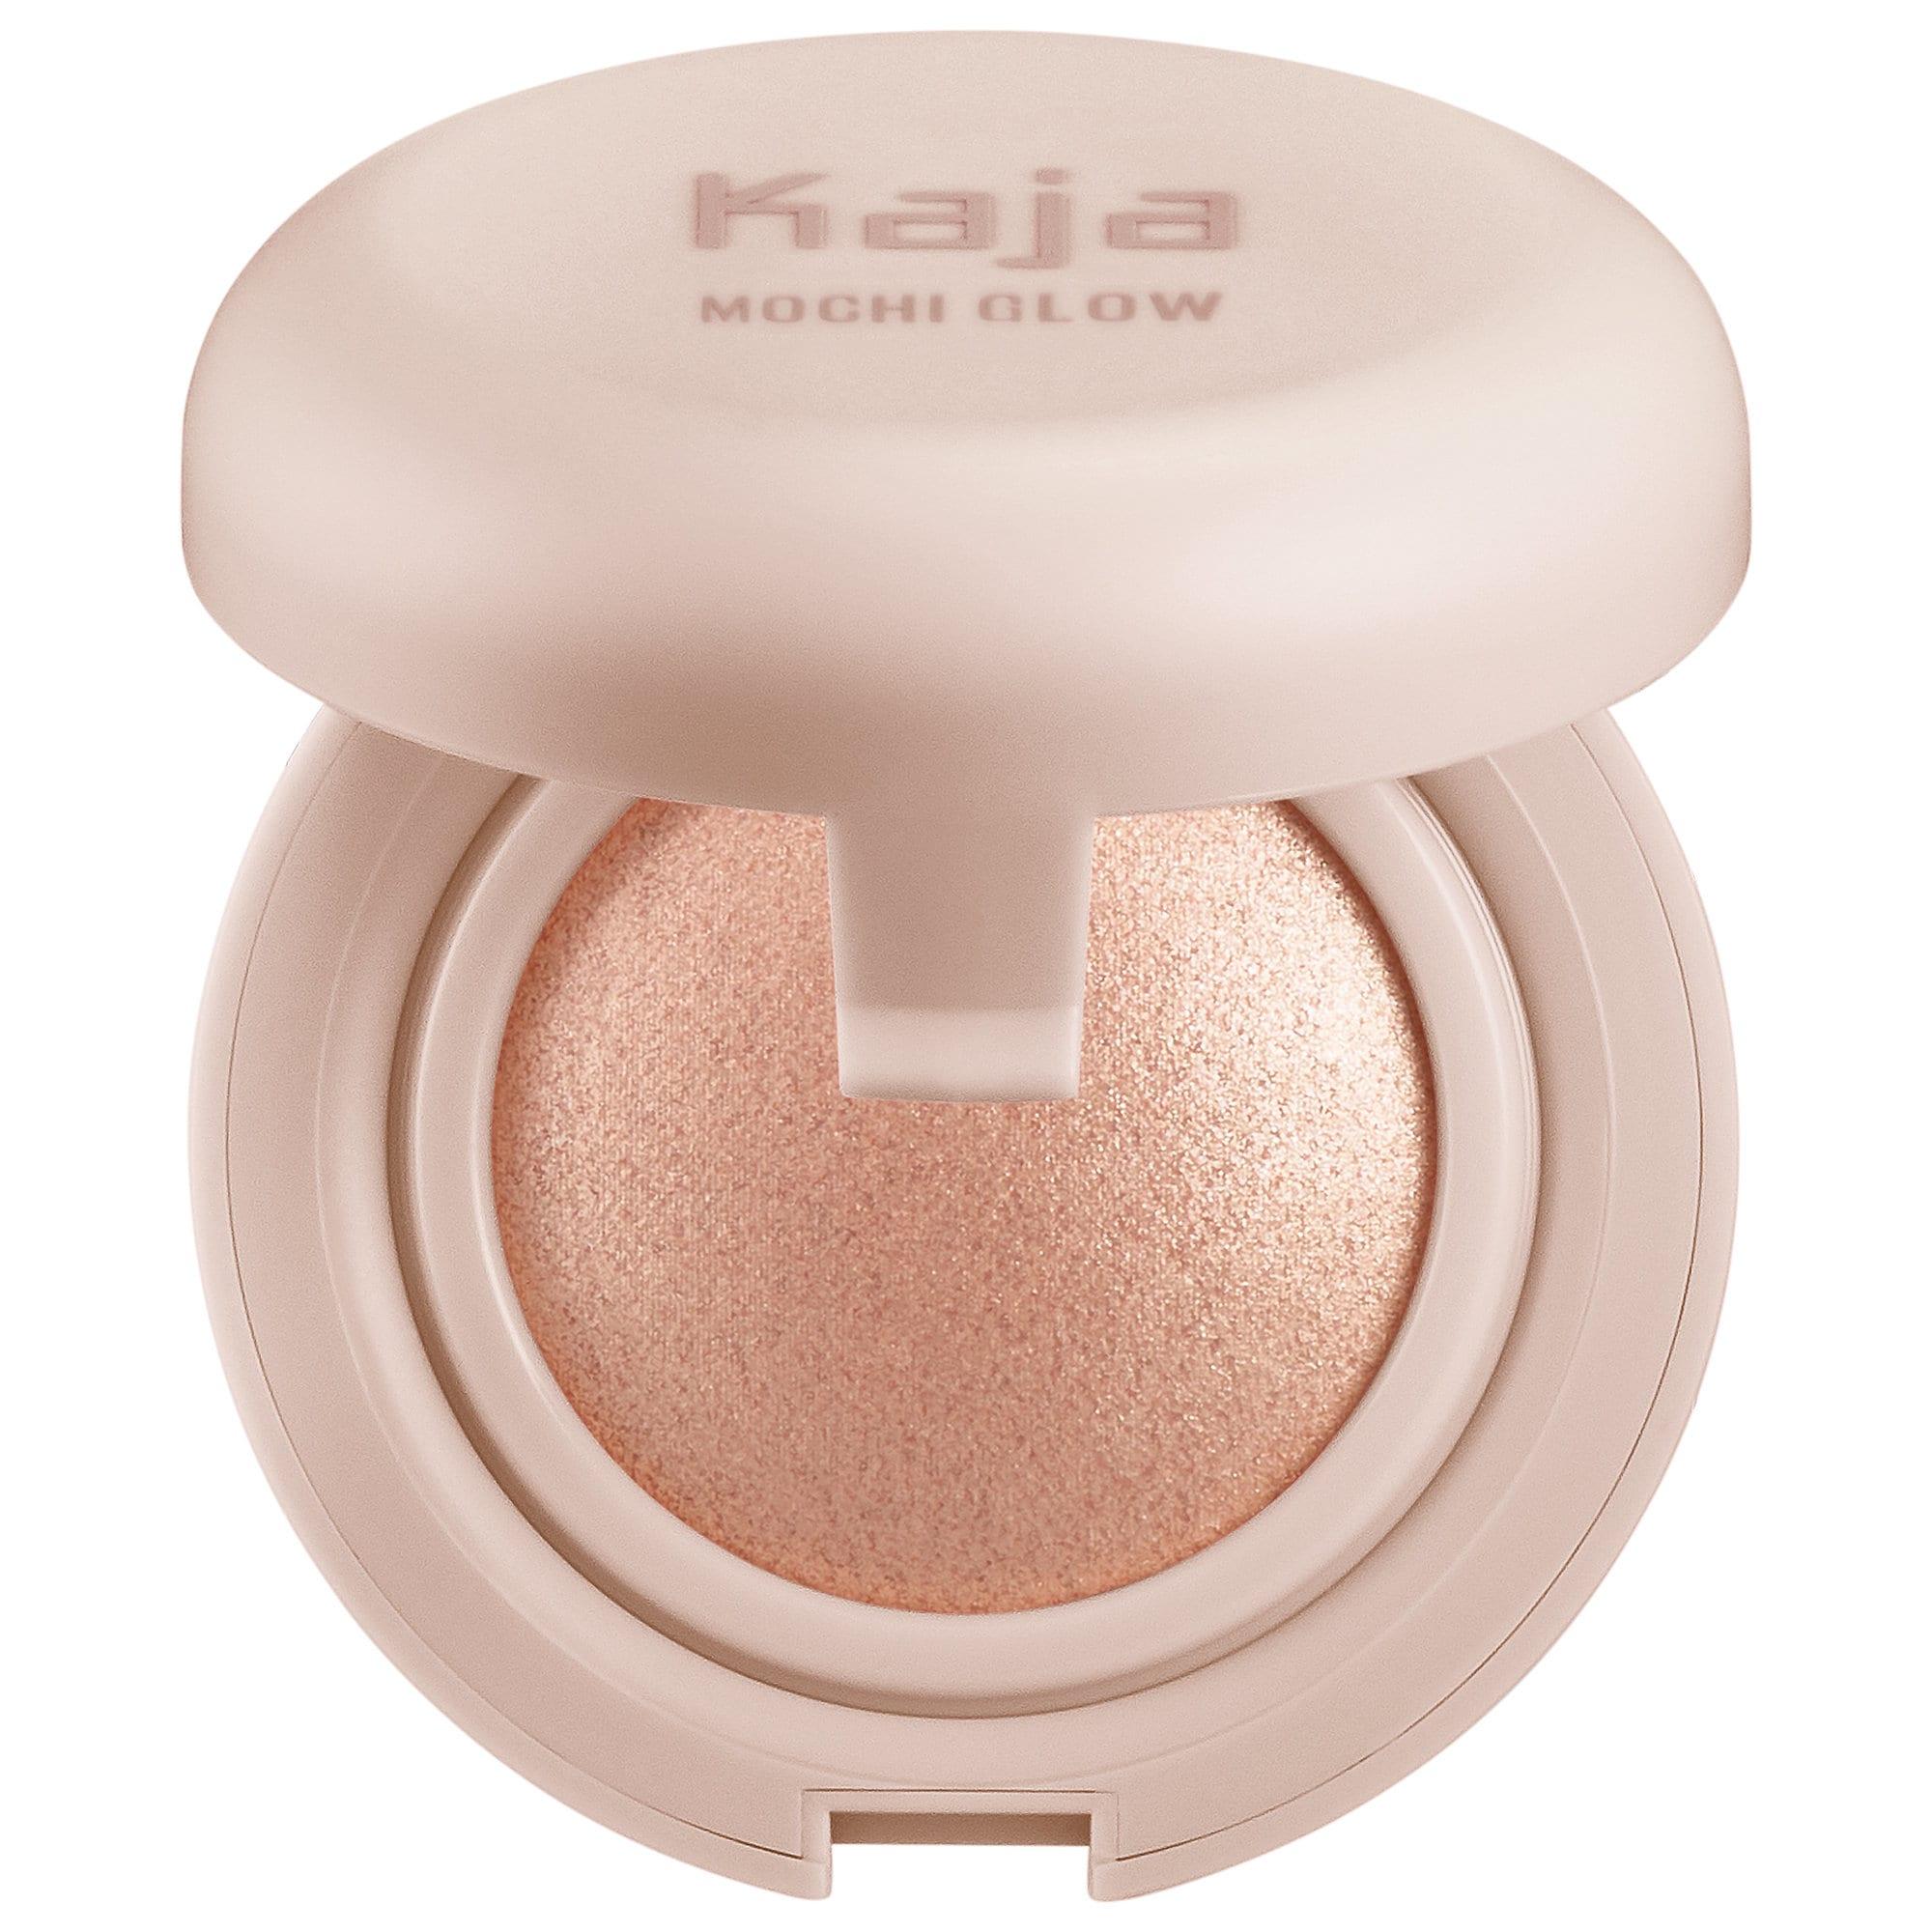 Mochi Glow Bouncy Highlighter Kaja Sephora Powder Highlighter Skin Cleanser Products Highlighter